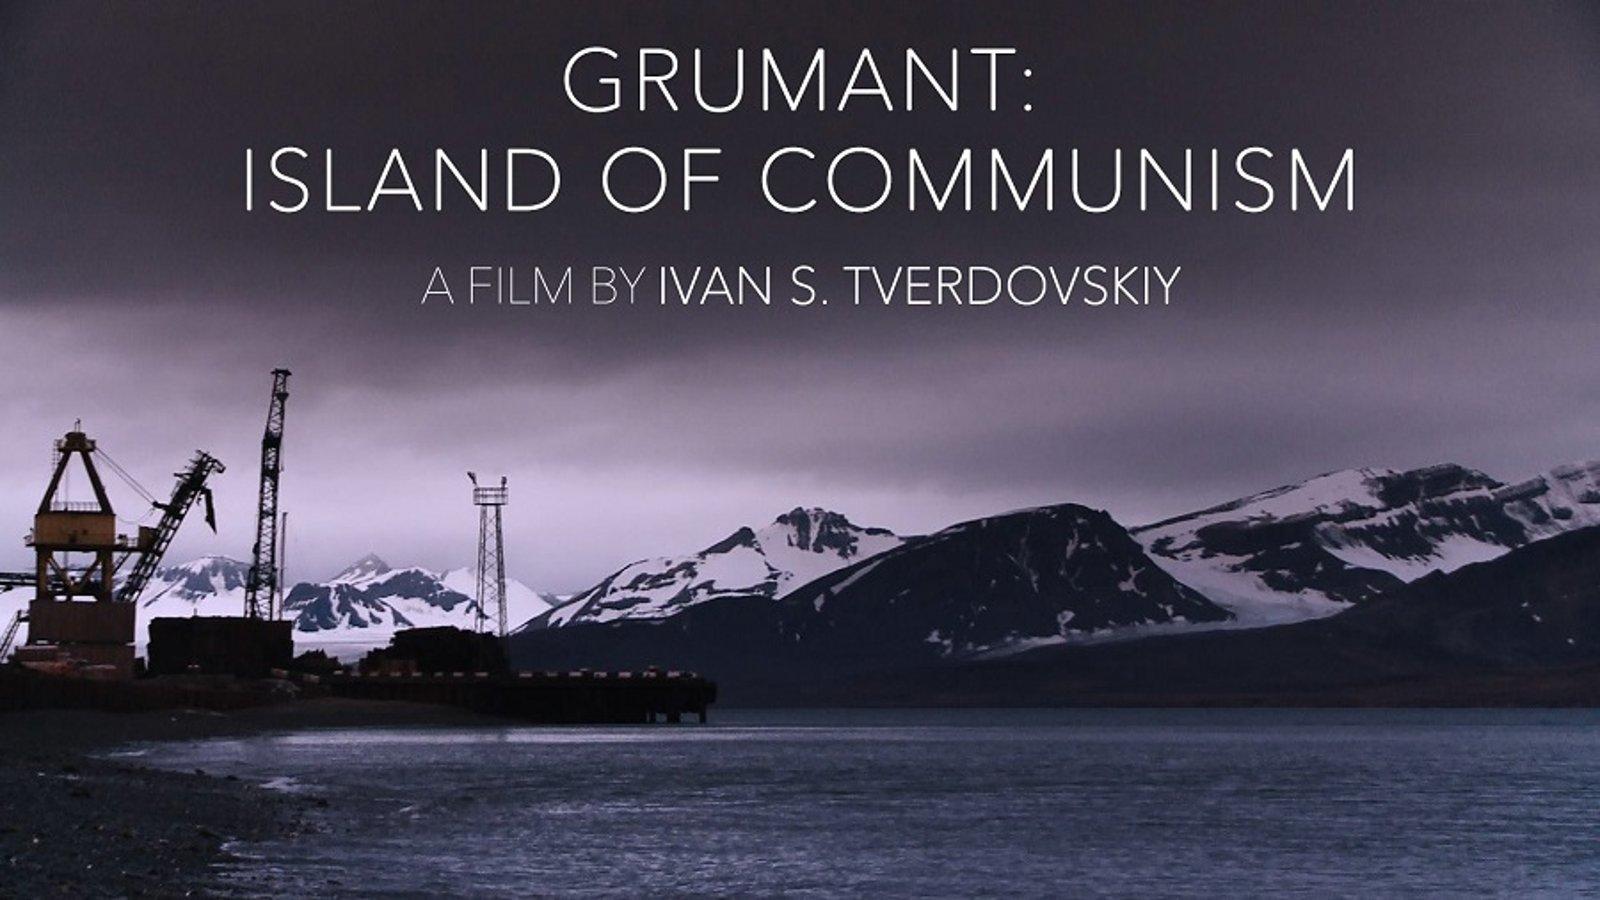 Grumant: Island of Communism - Life in an Arctic Soviet Settlement